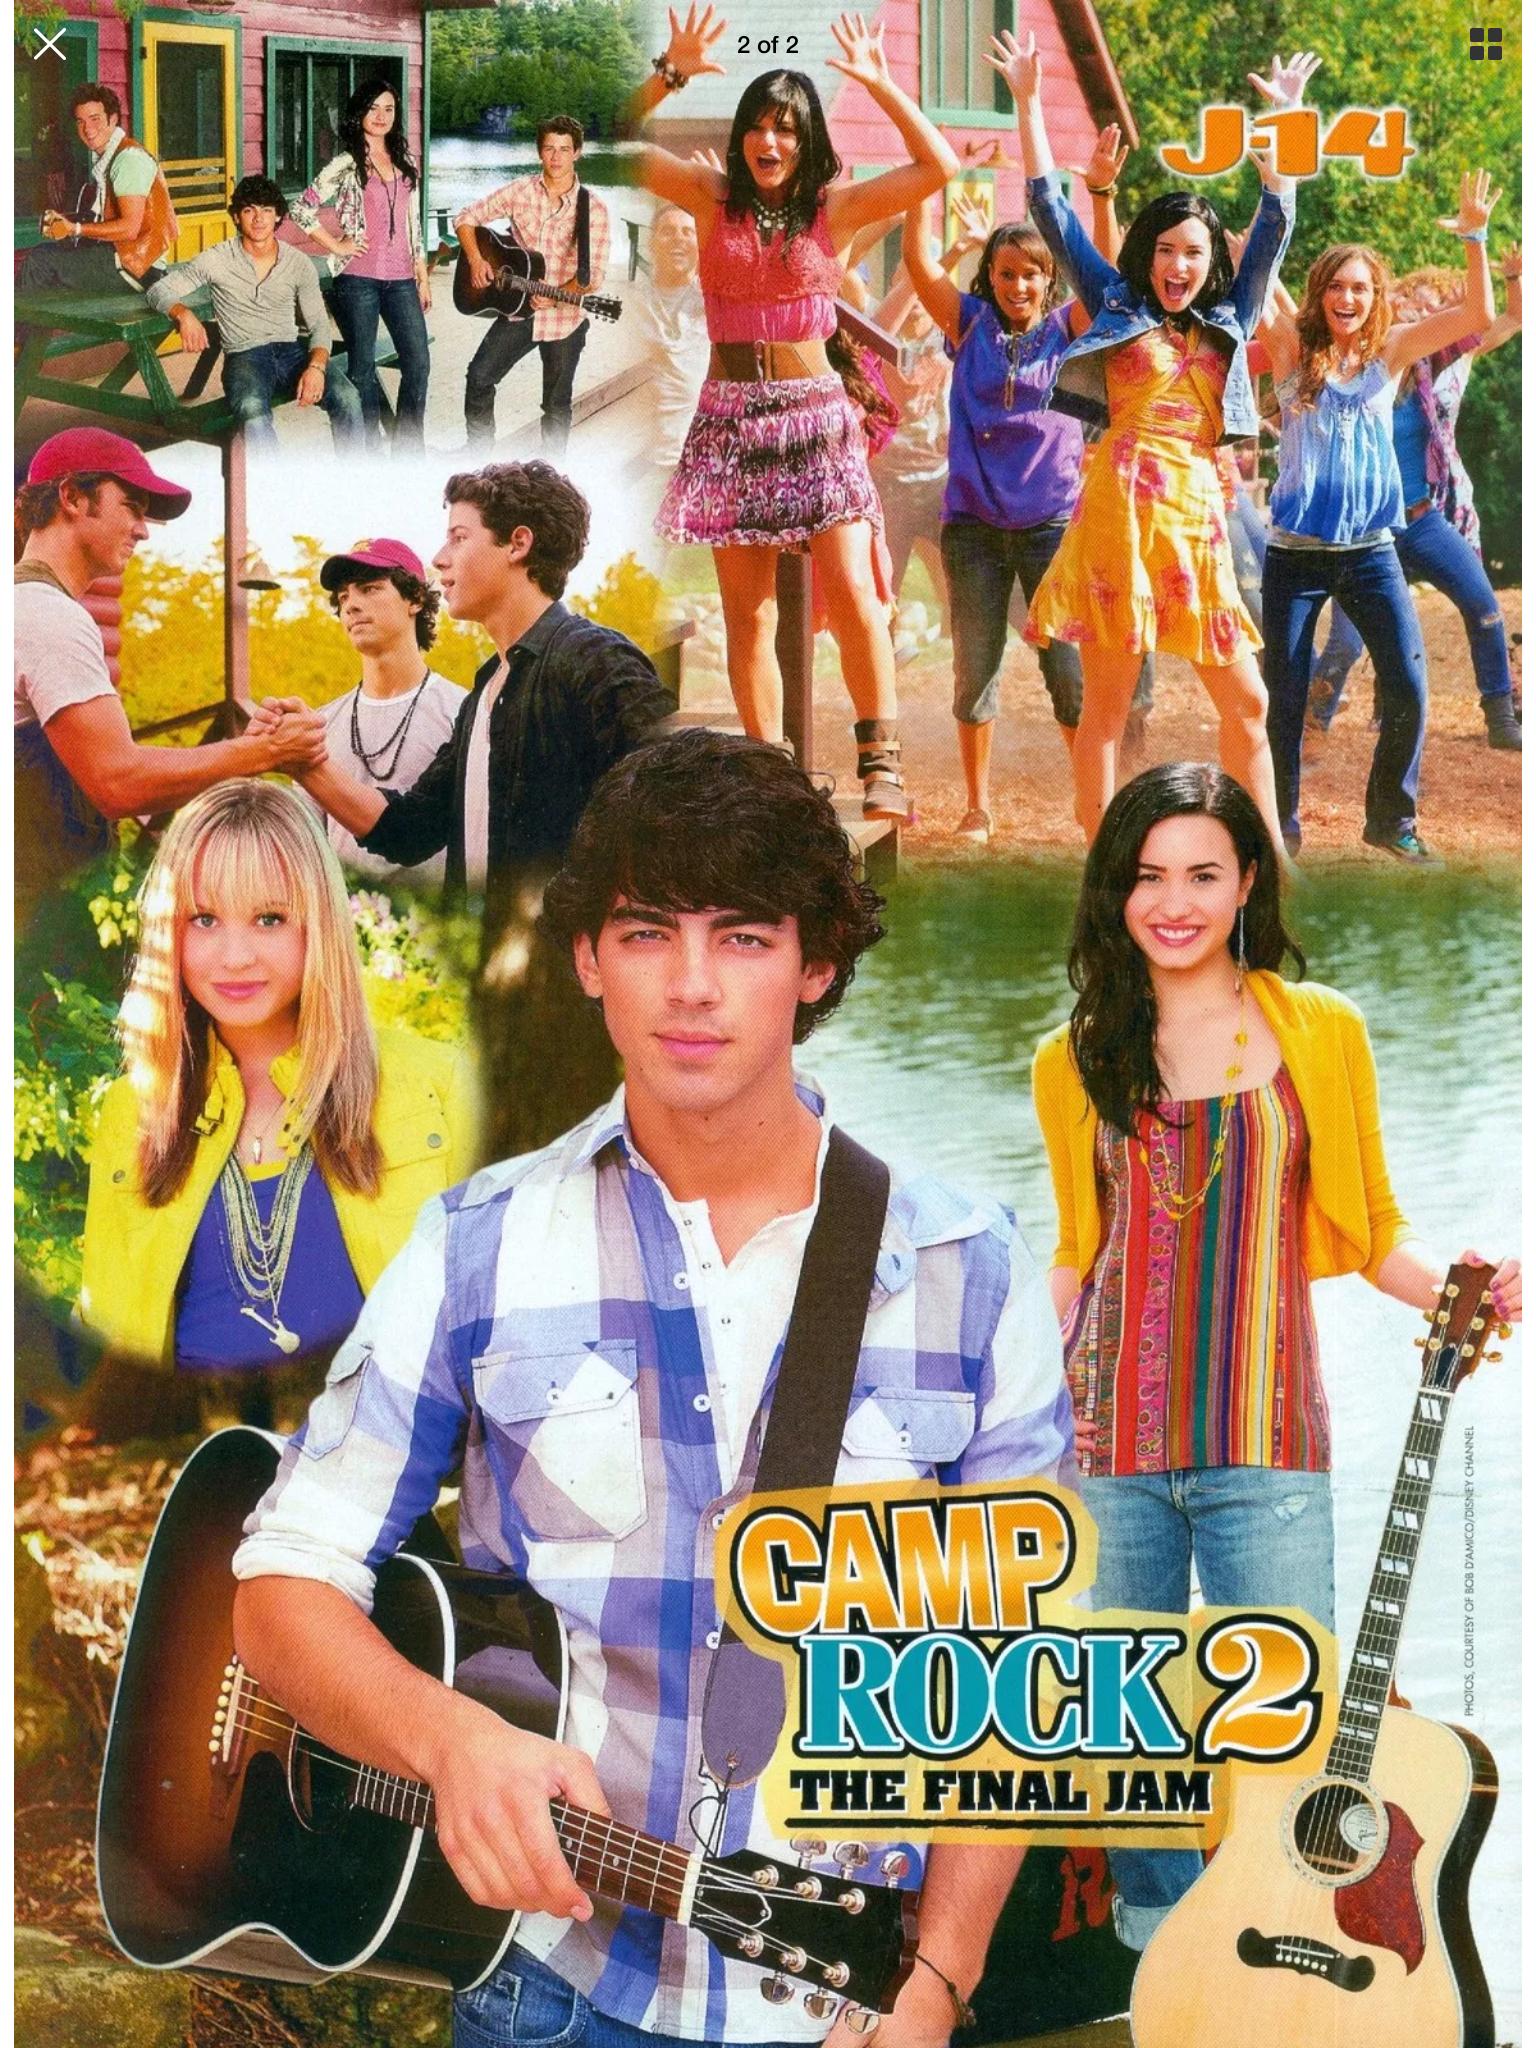 Camp Rock 2 The Final Jam J 14 Demi Lovato Jonas Brothers Camp Rock Jonas Brothers Demi Lovato